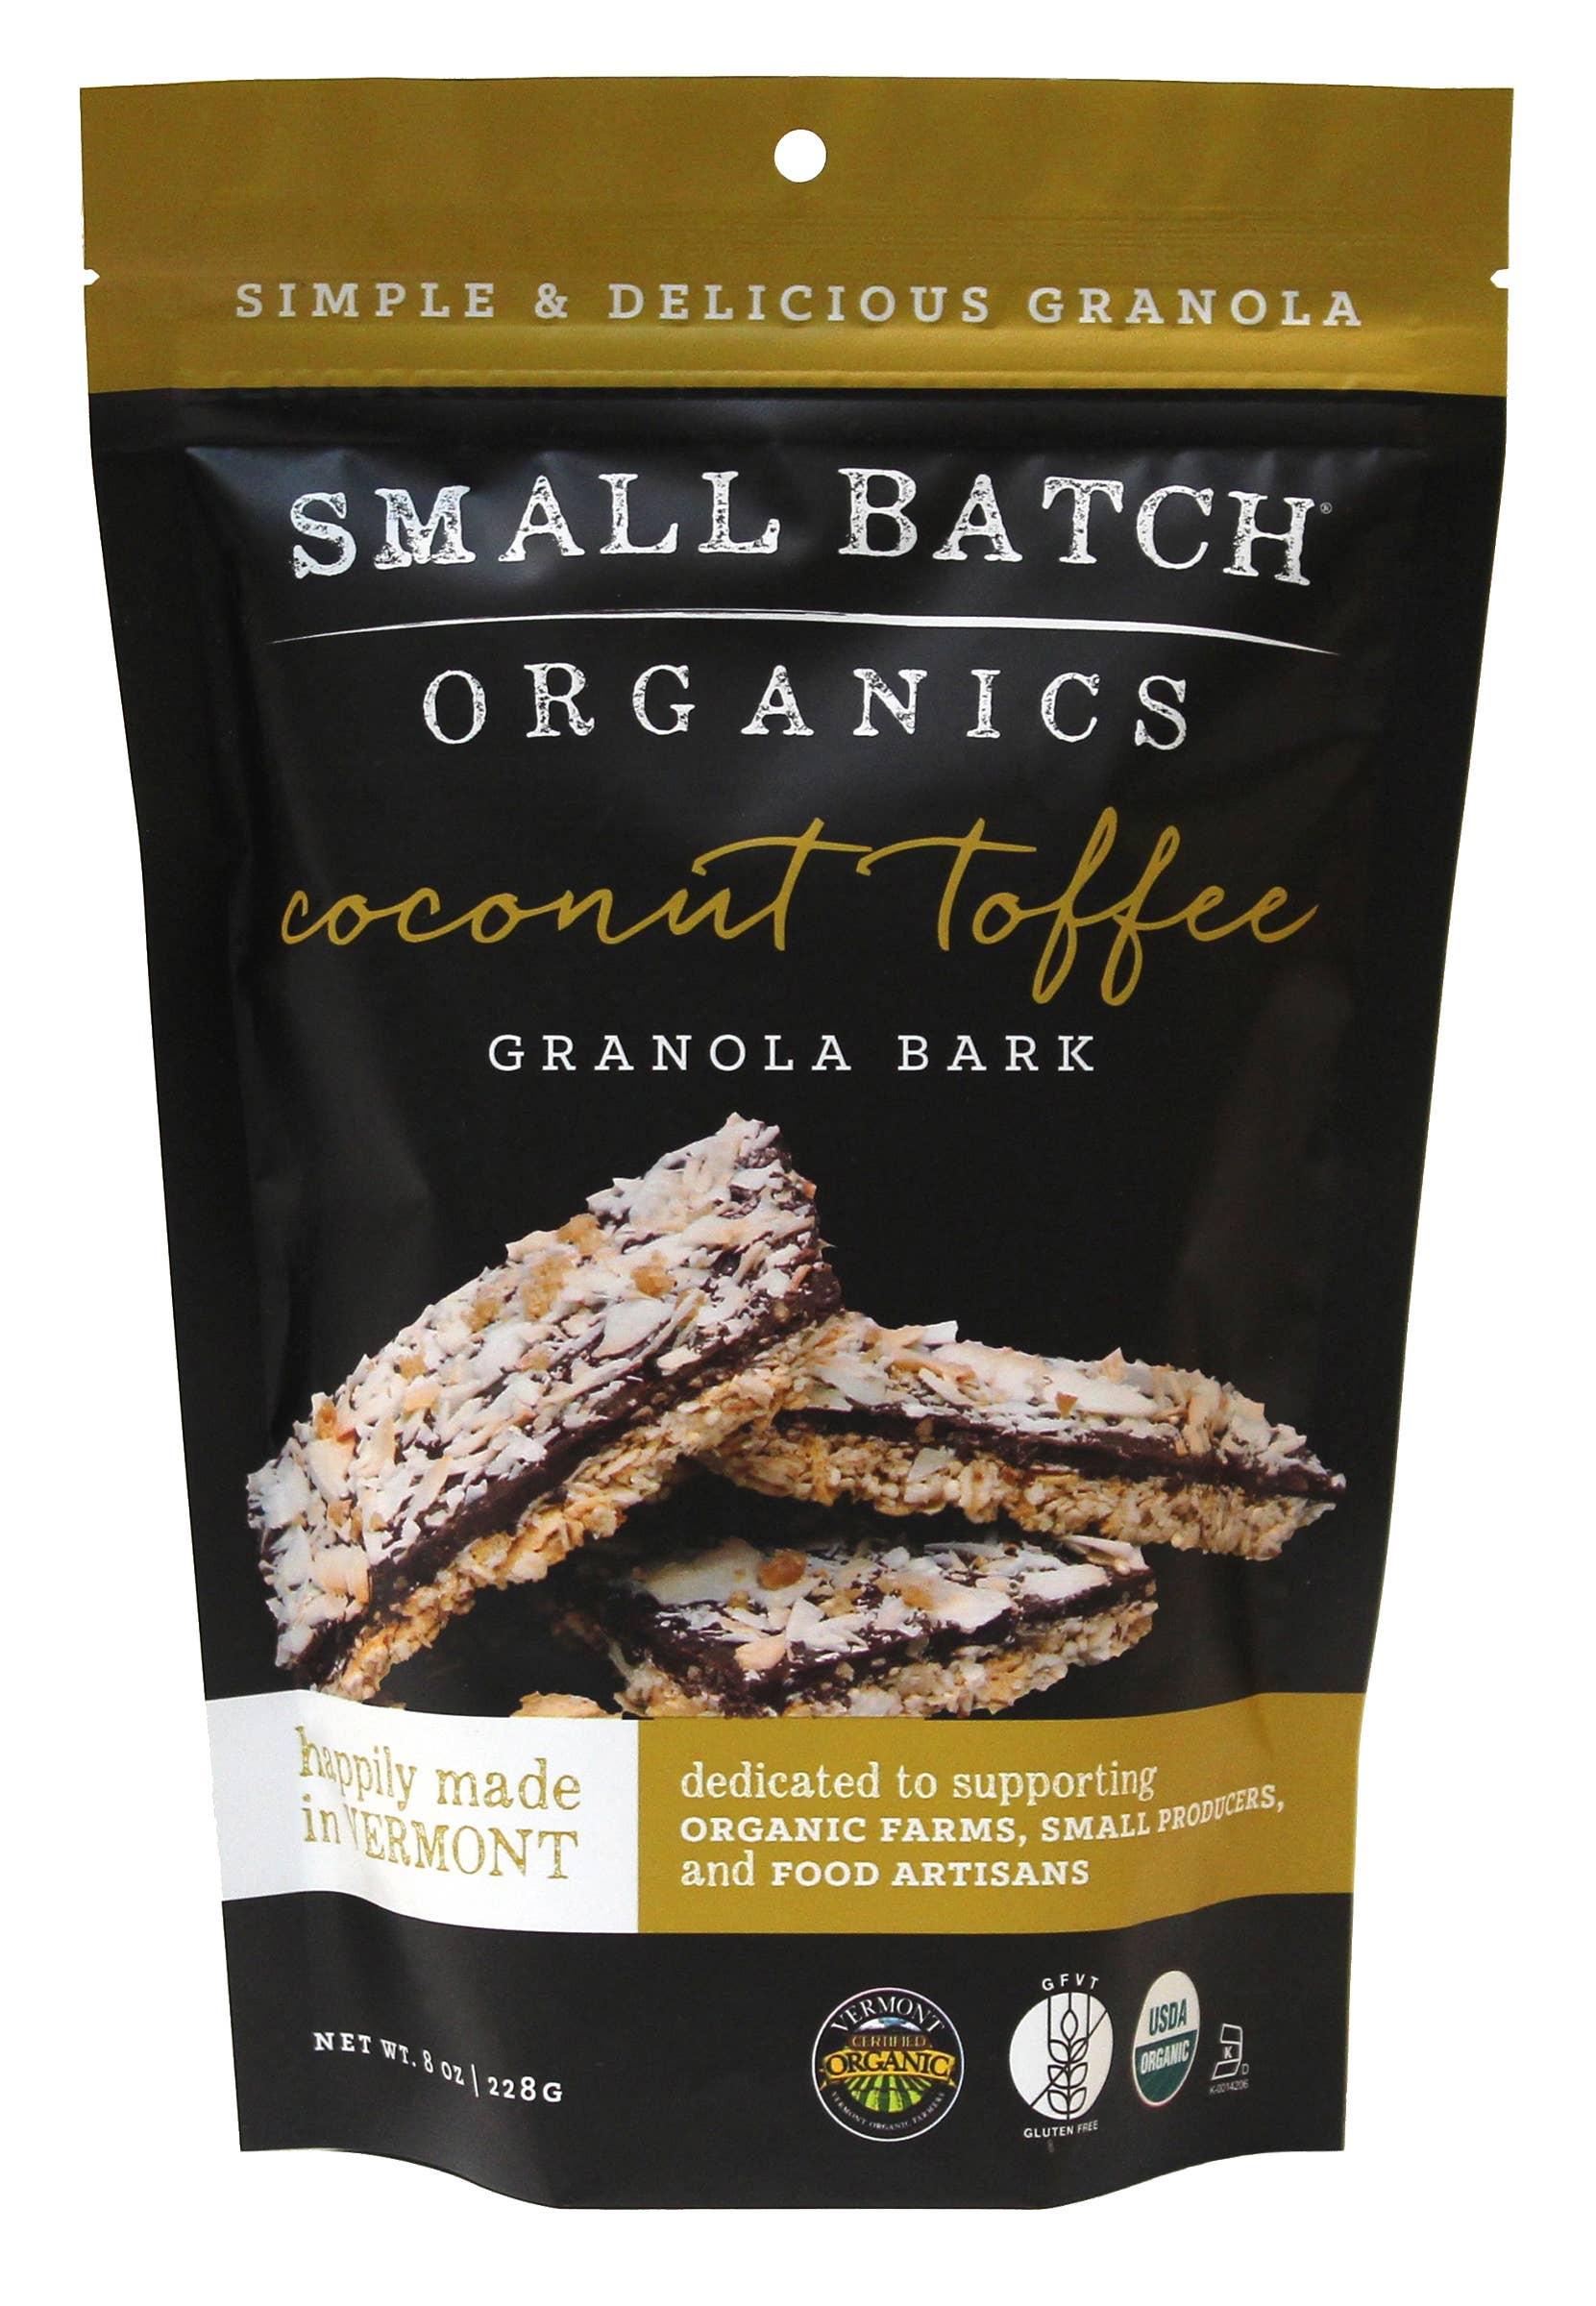 8oz Coconut Toffee Granola Bark | Trada Marketplace